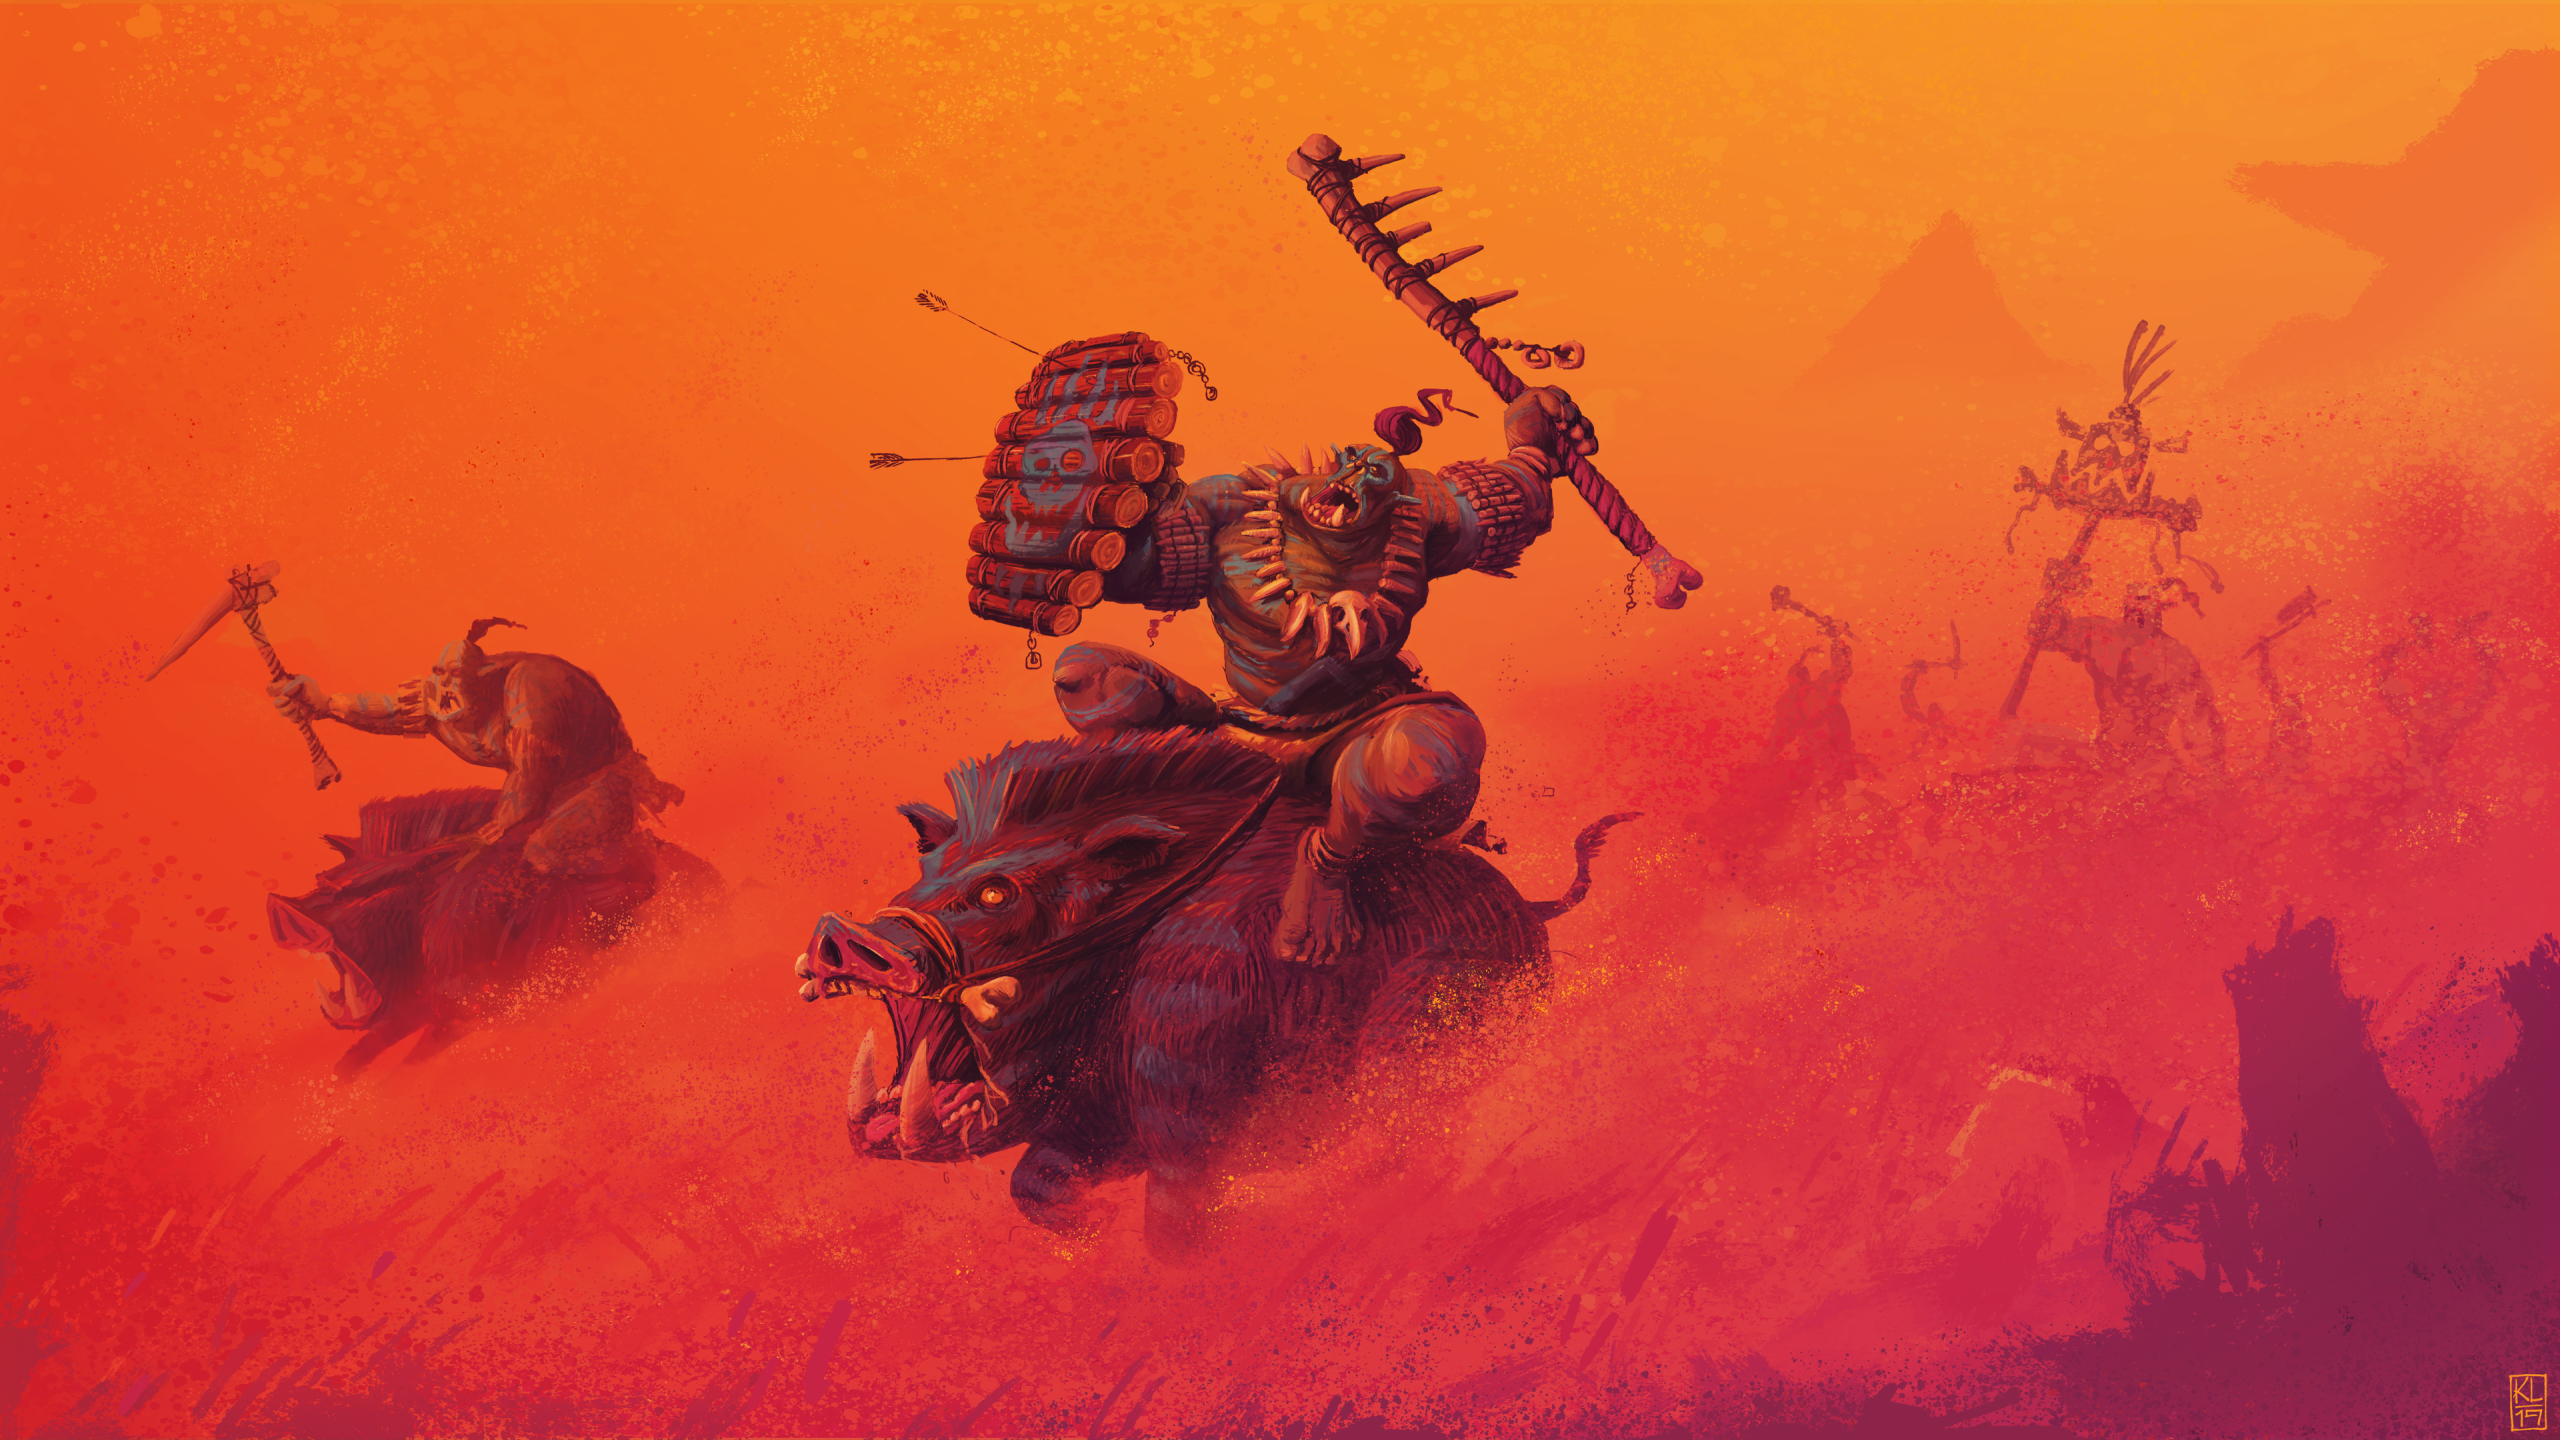 Warhammer Fantasy Art Orcs , HD Wallpaper & Backgrounds